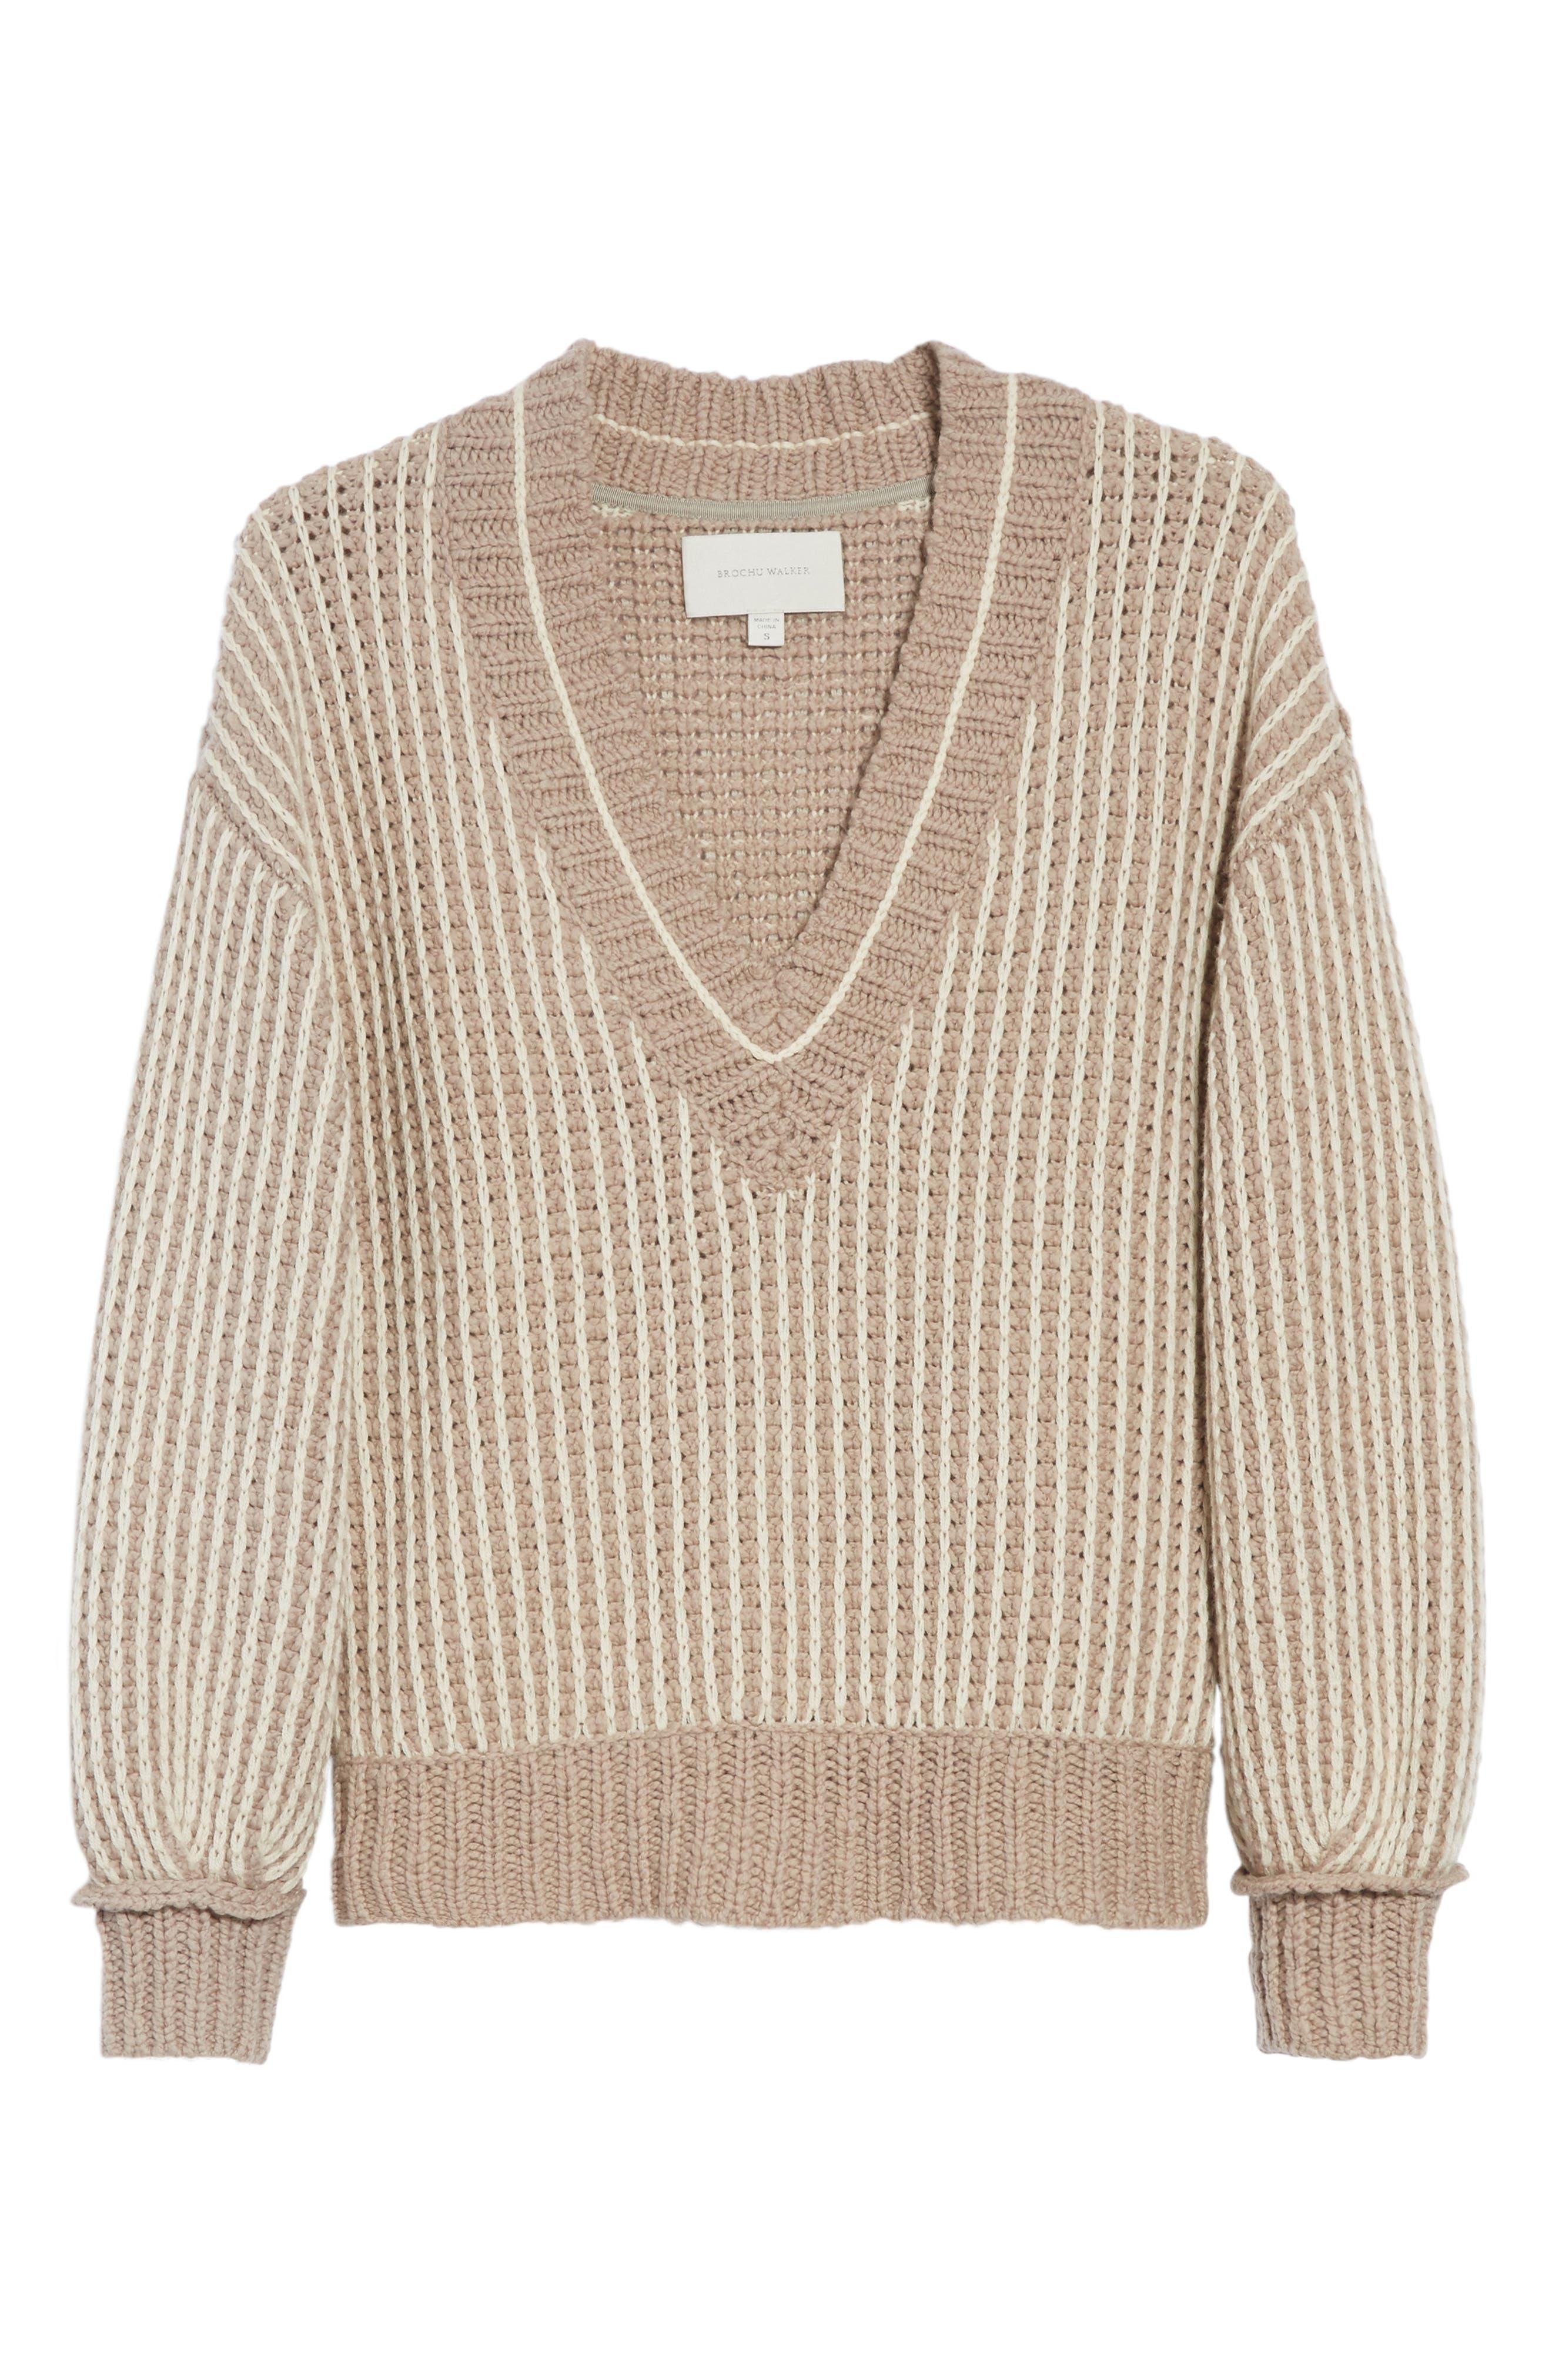 Jessen Stripe Wool & Cashmere Sweater,                             Alternate thumbnail 6, color,                             210